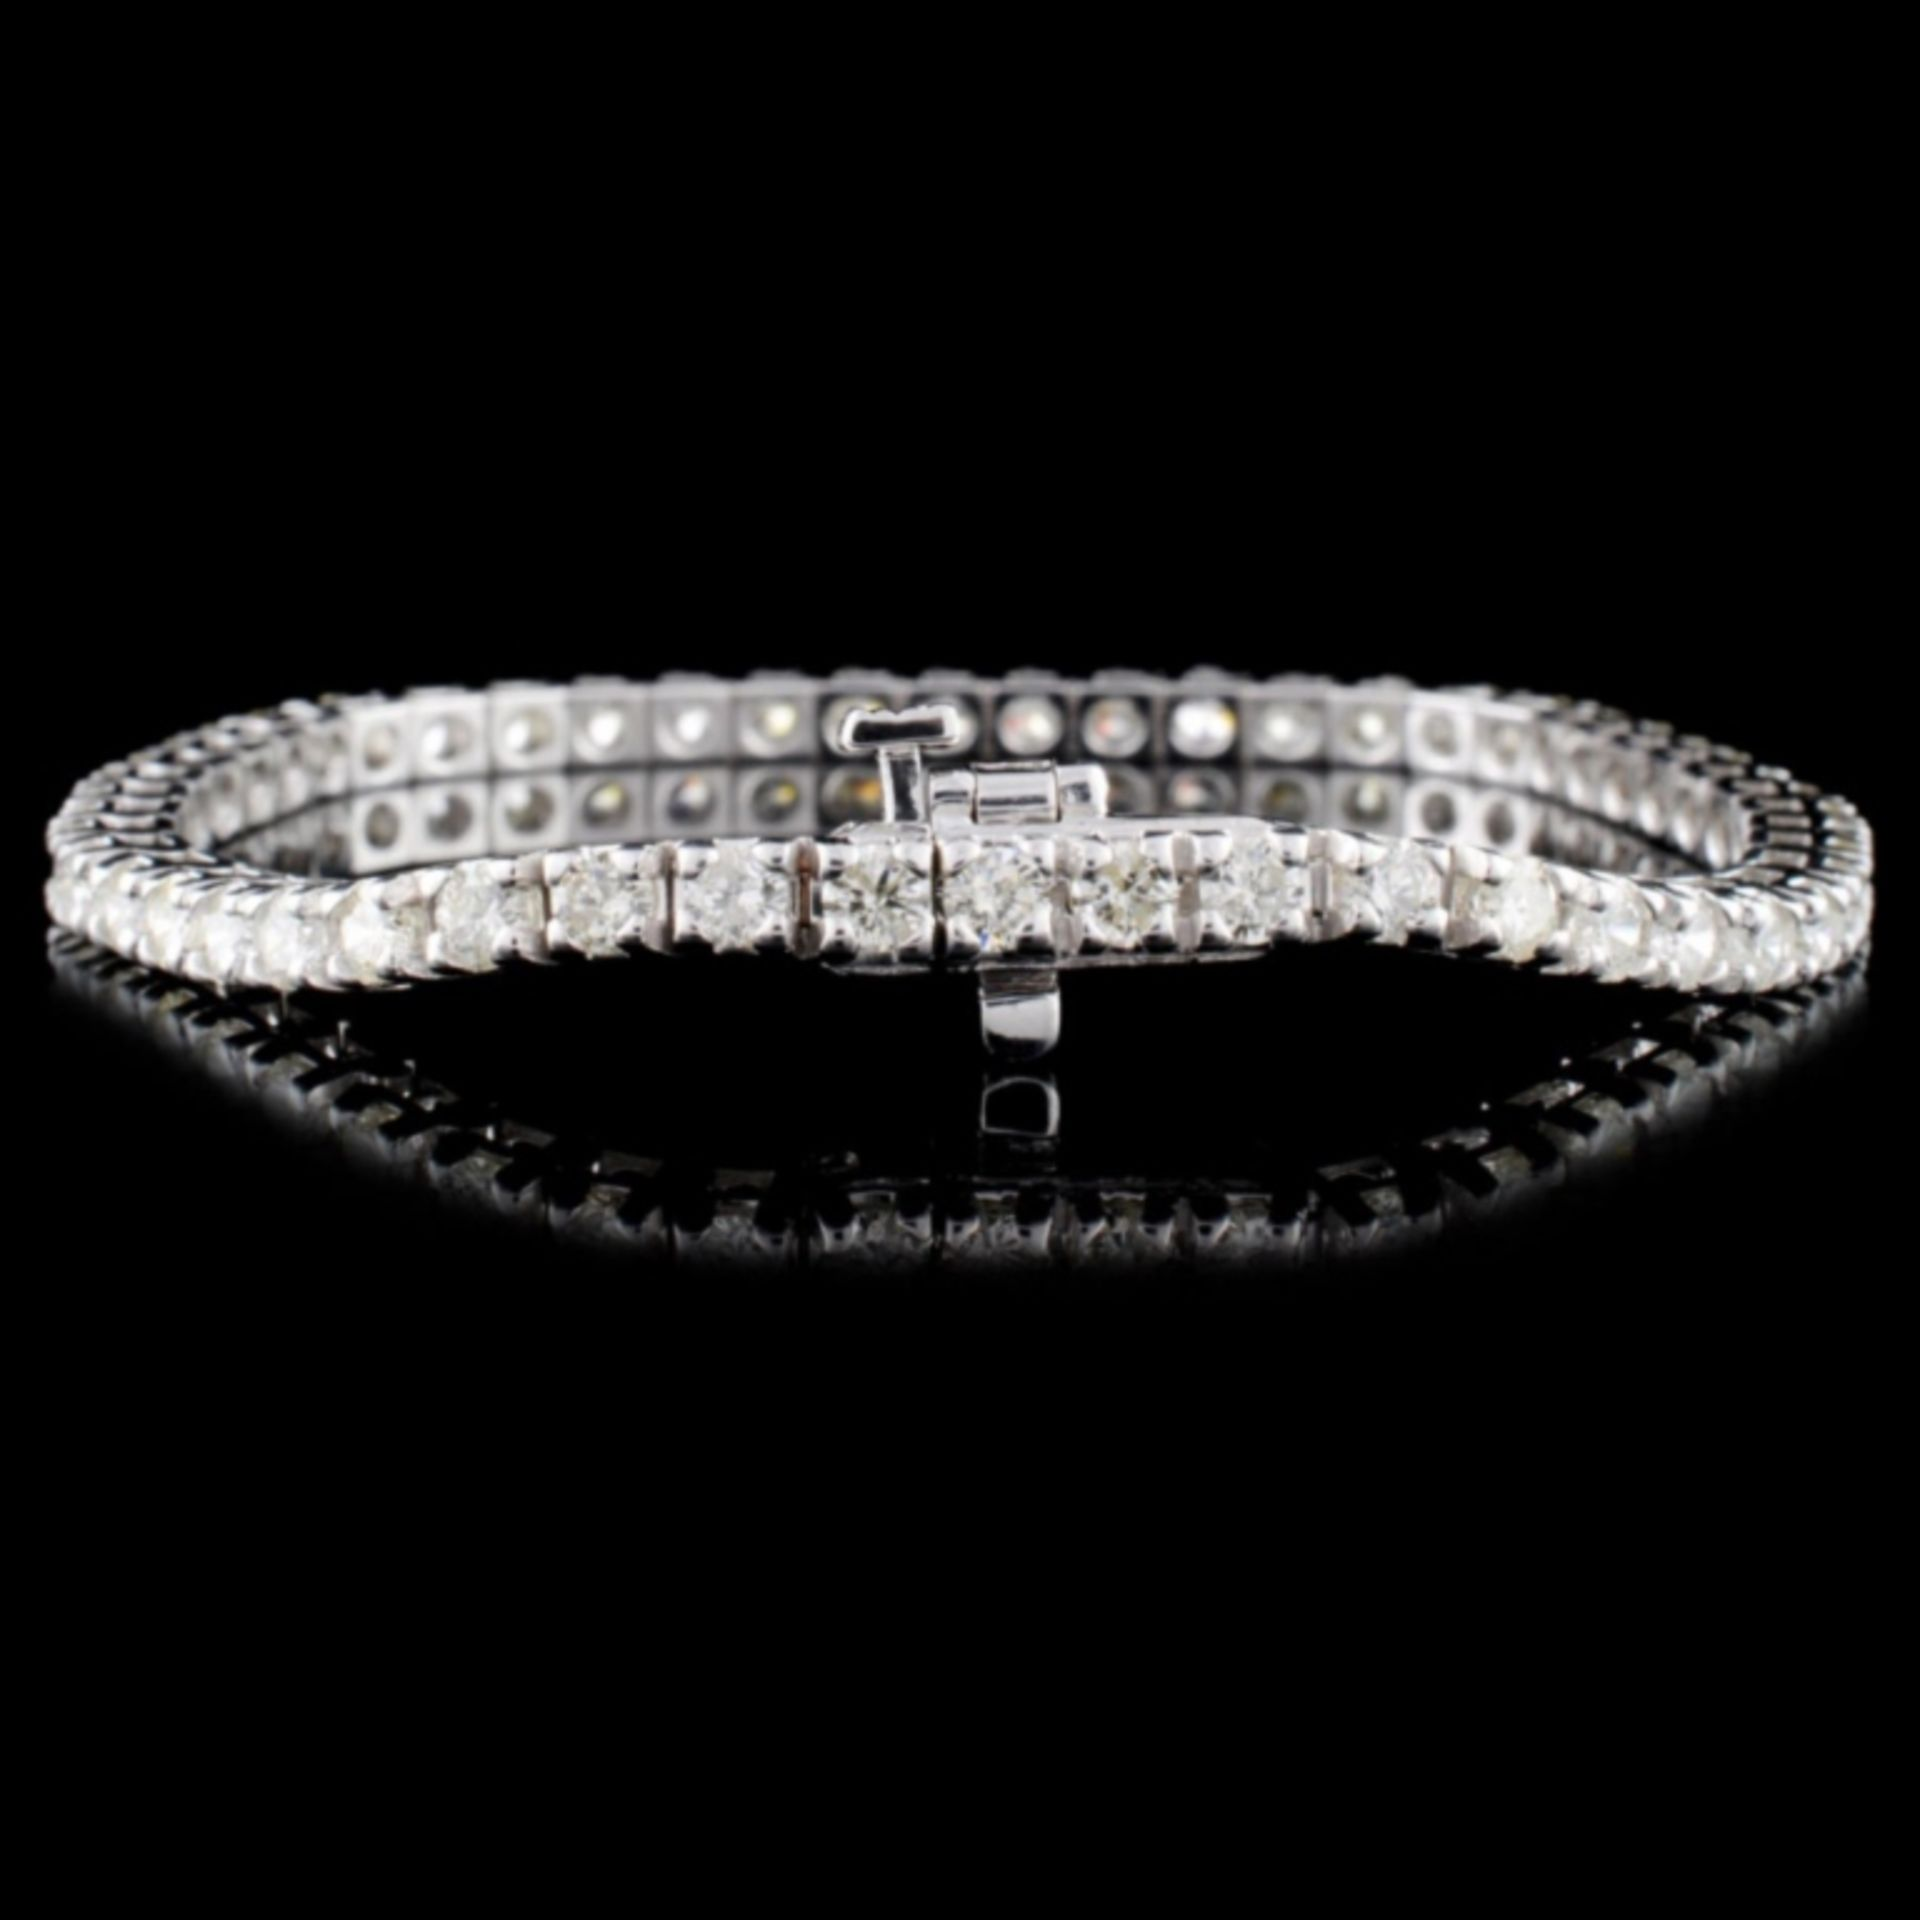 14K White Gold 4.00ctw Diamond Bracelet - Image 2 of 3